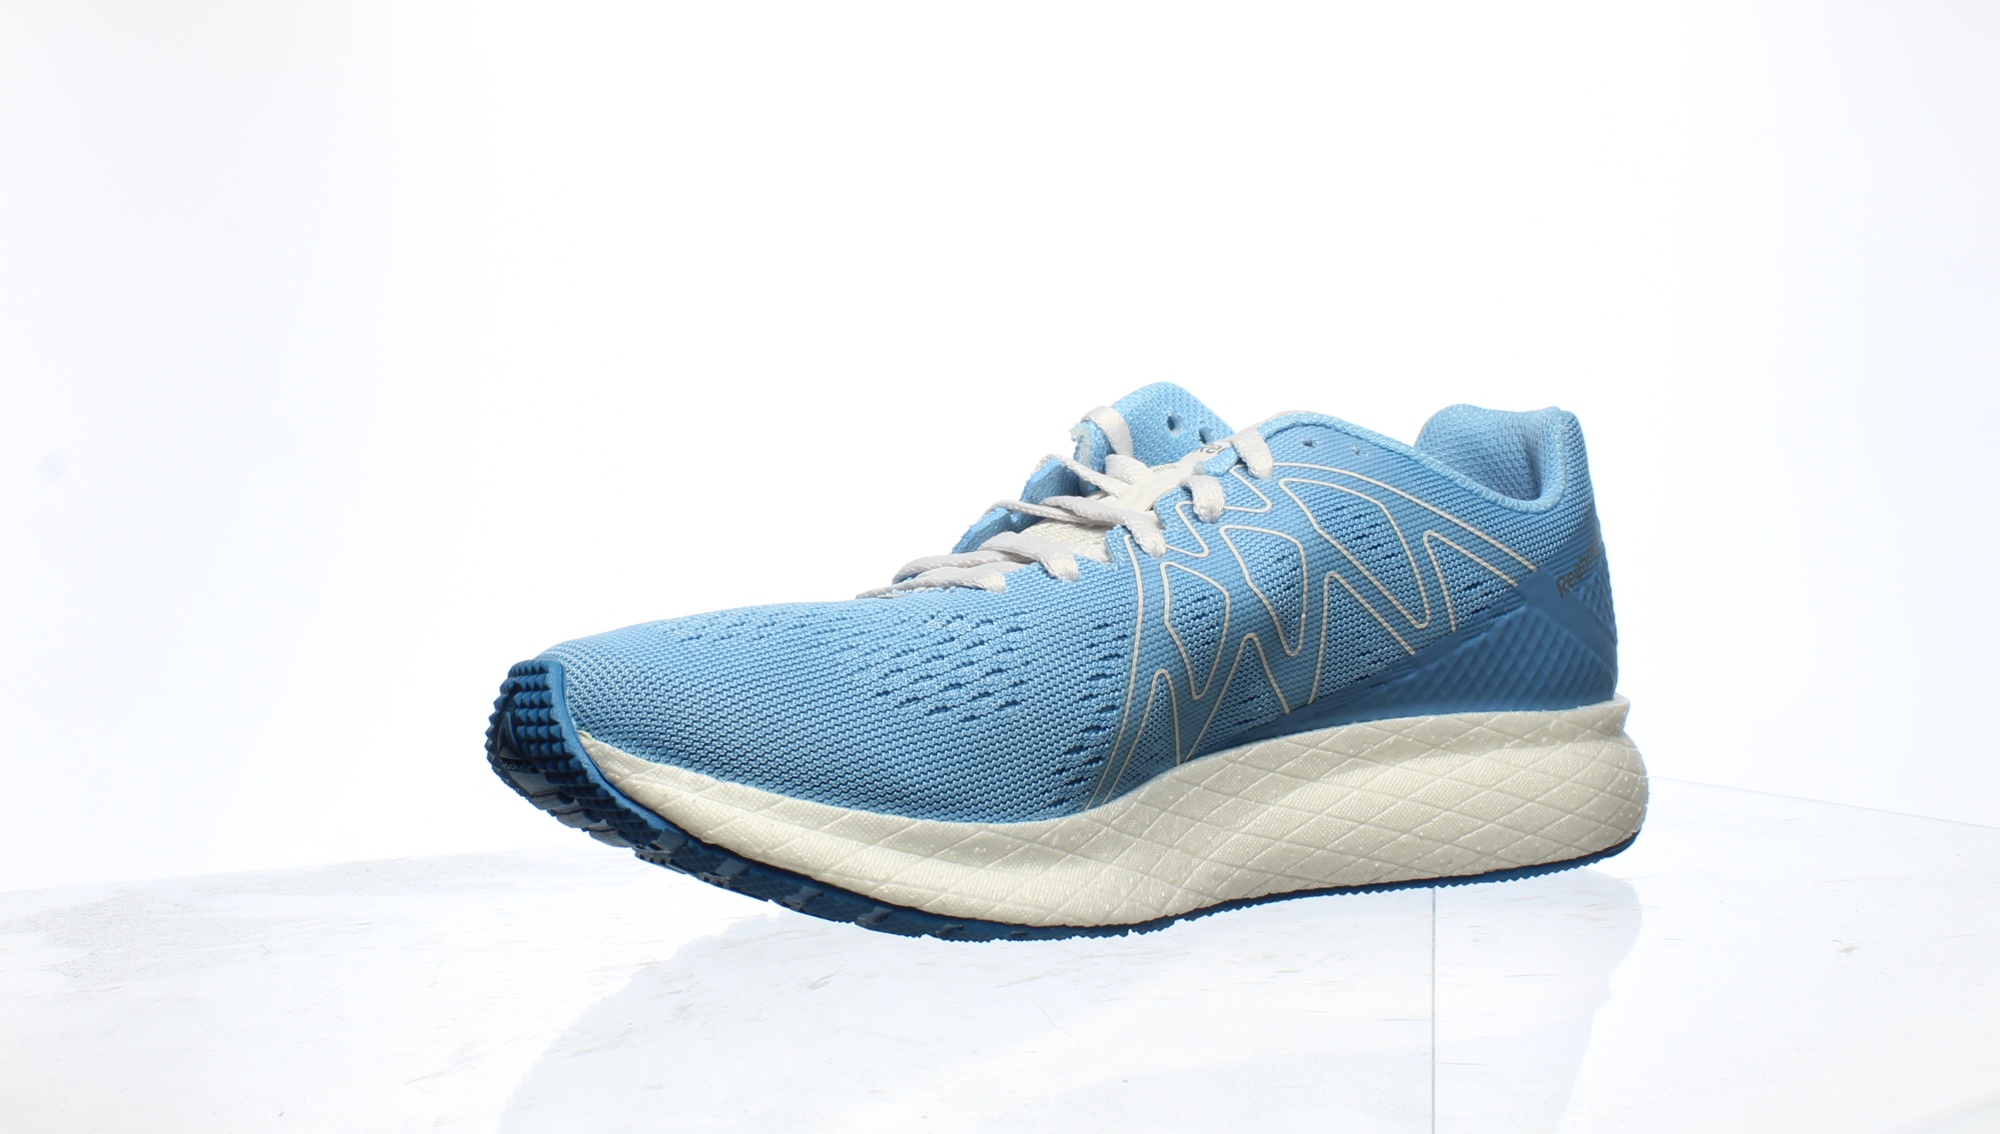 Reebok-Womens-Forever-Floatride-Energy-Running-Shoes thumbnail 15